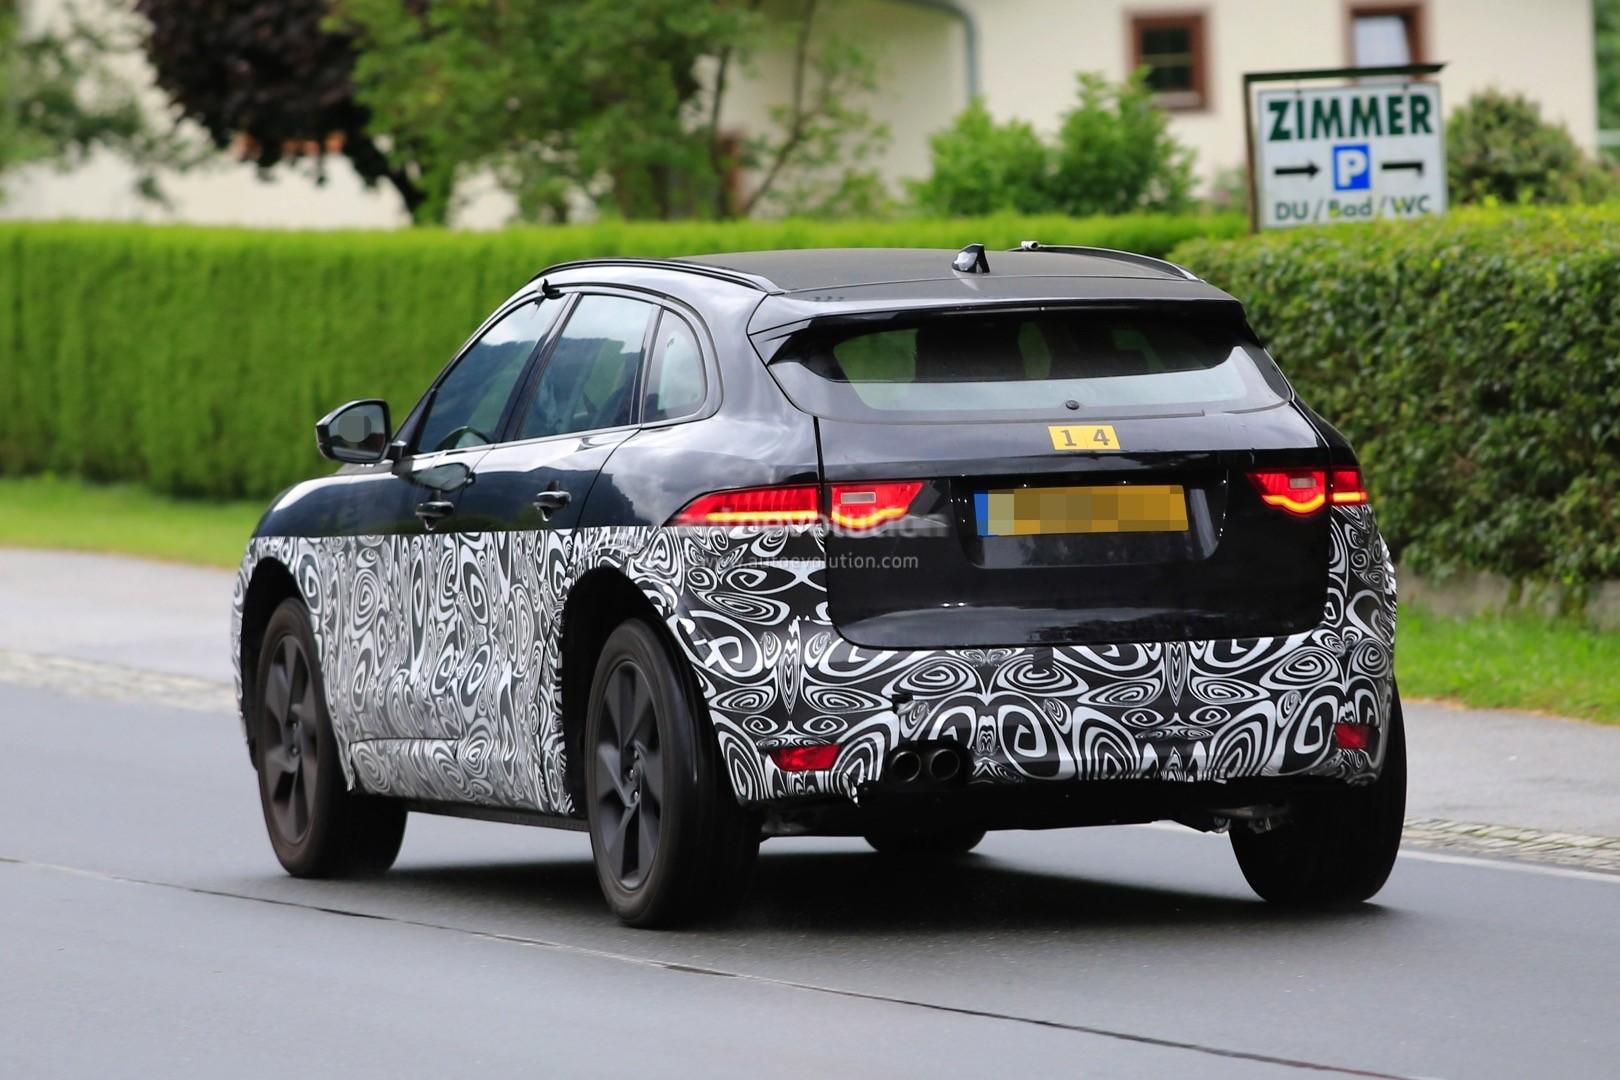 jaguar s electric suv teased ahead of 2016 la auto show autoevolution. Black Bedroom Furniture Sets. Home Design Ideas